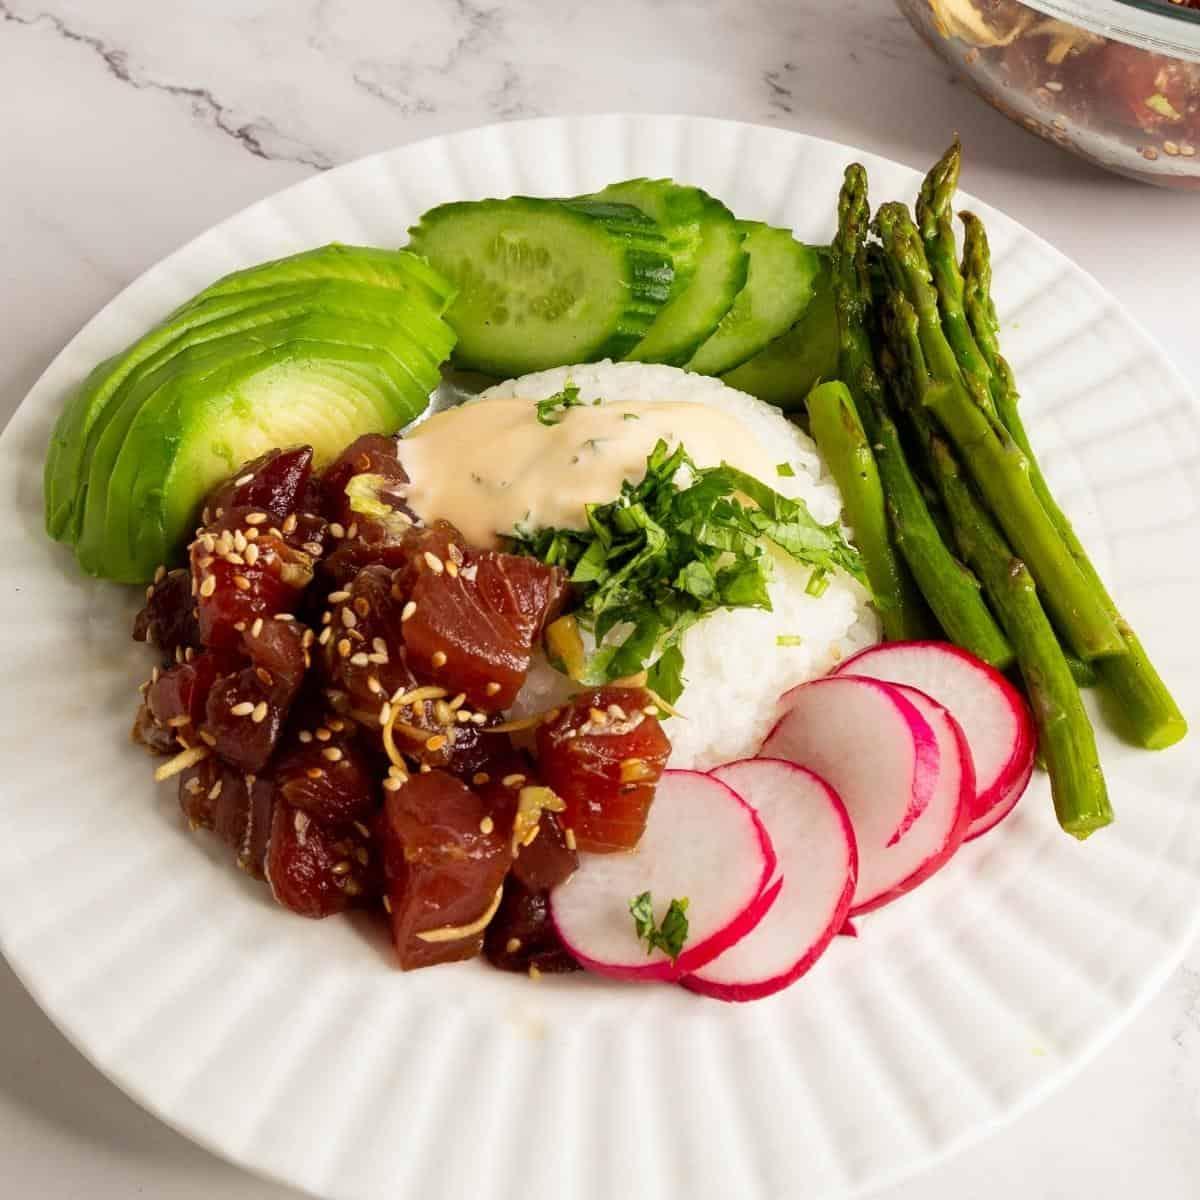 Ahi tuna over steamed rice.